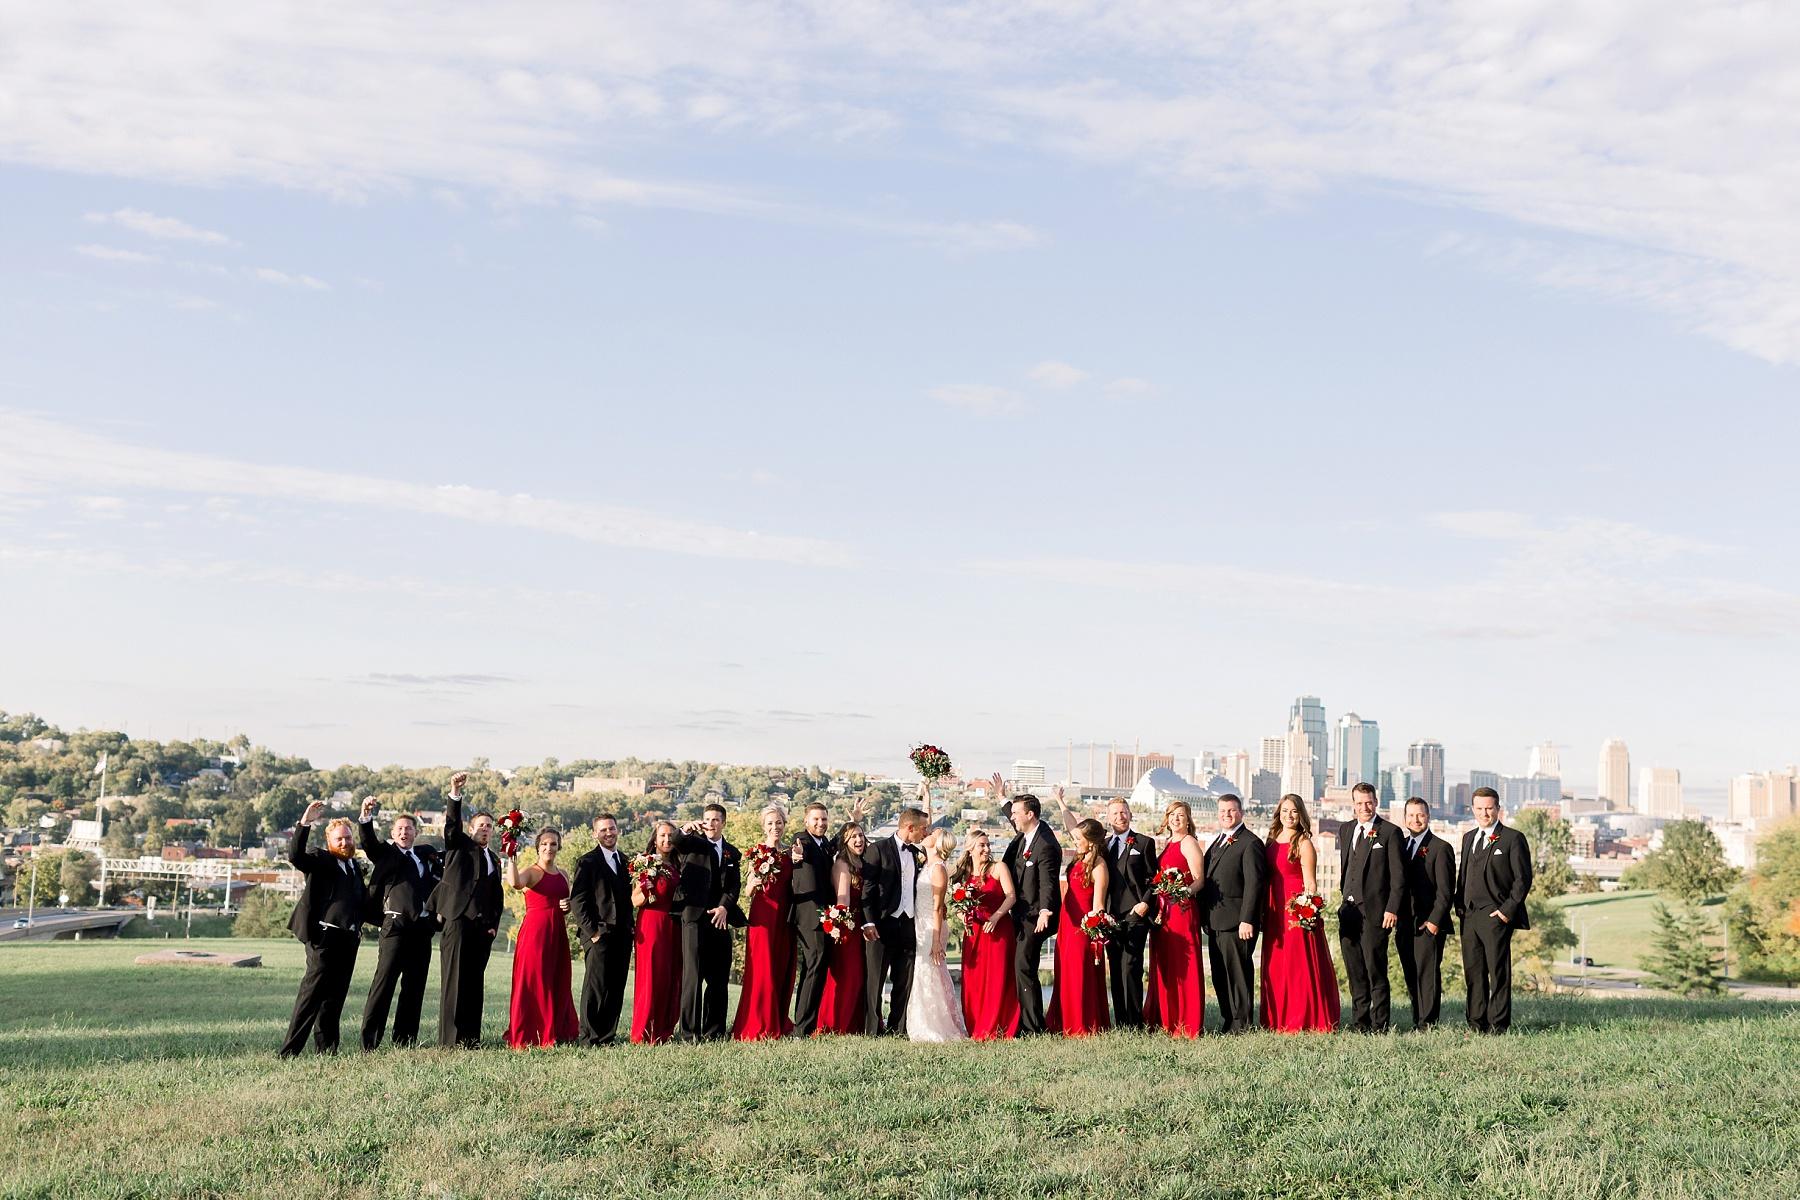 midwest-adventurous-wedding-photographer-elizabeth-ladean-photography-photo_4854.jpg